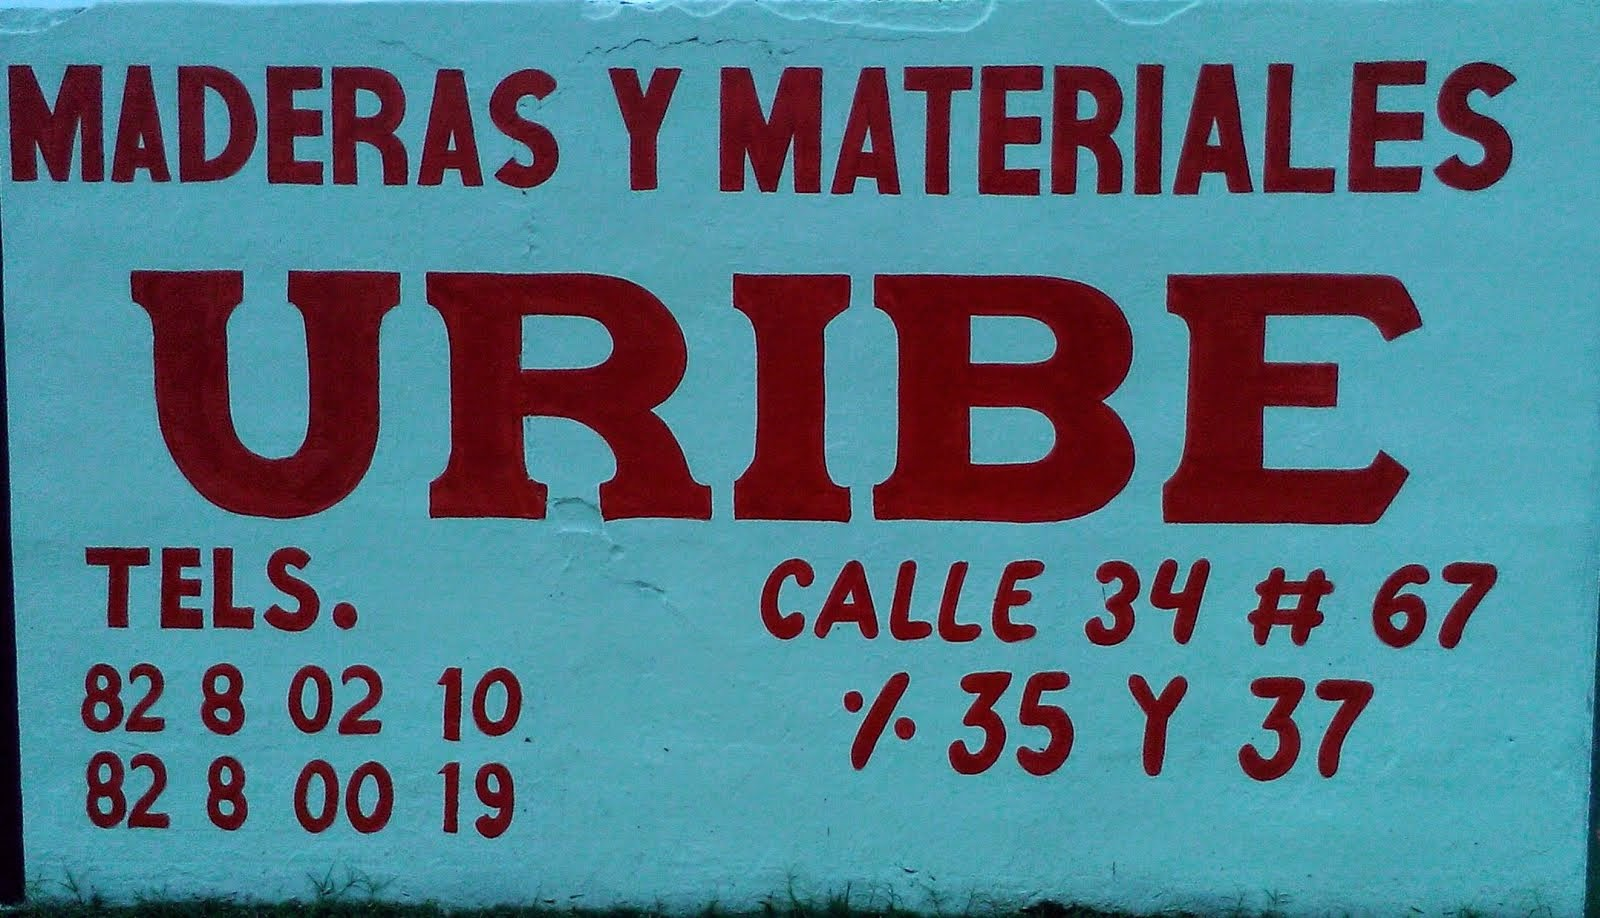 MADERAS Y MATERIALES URIBE